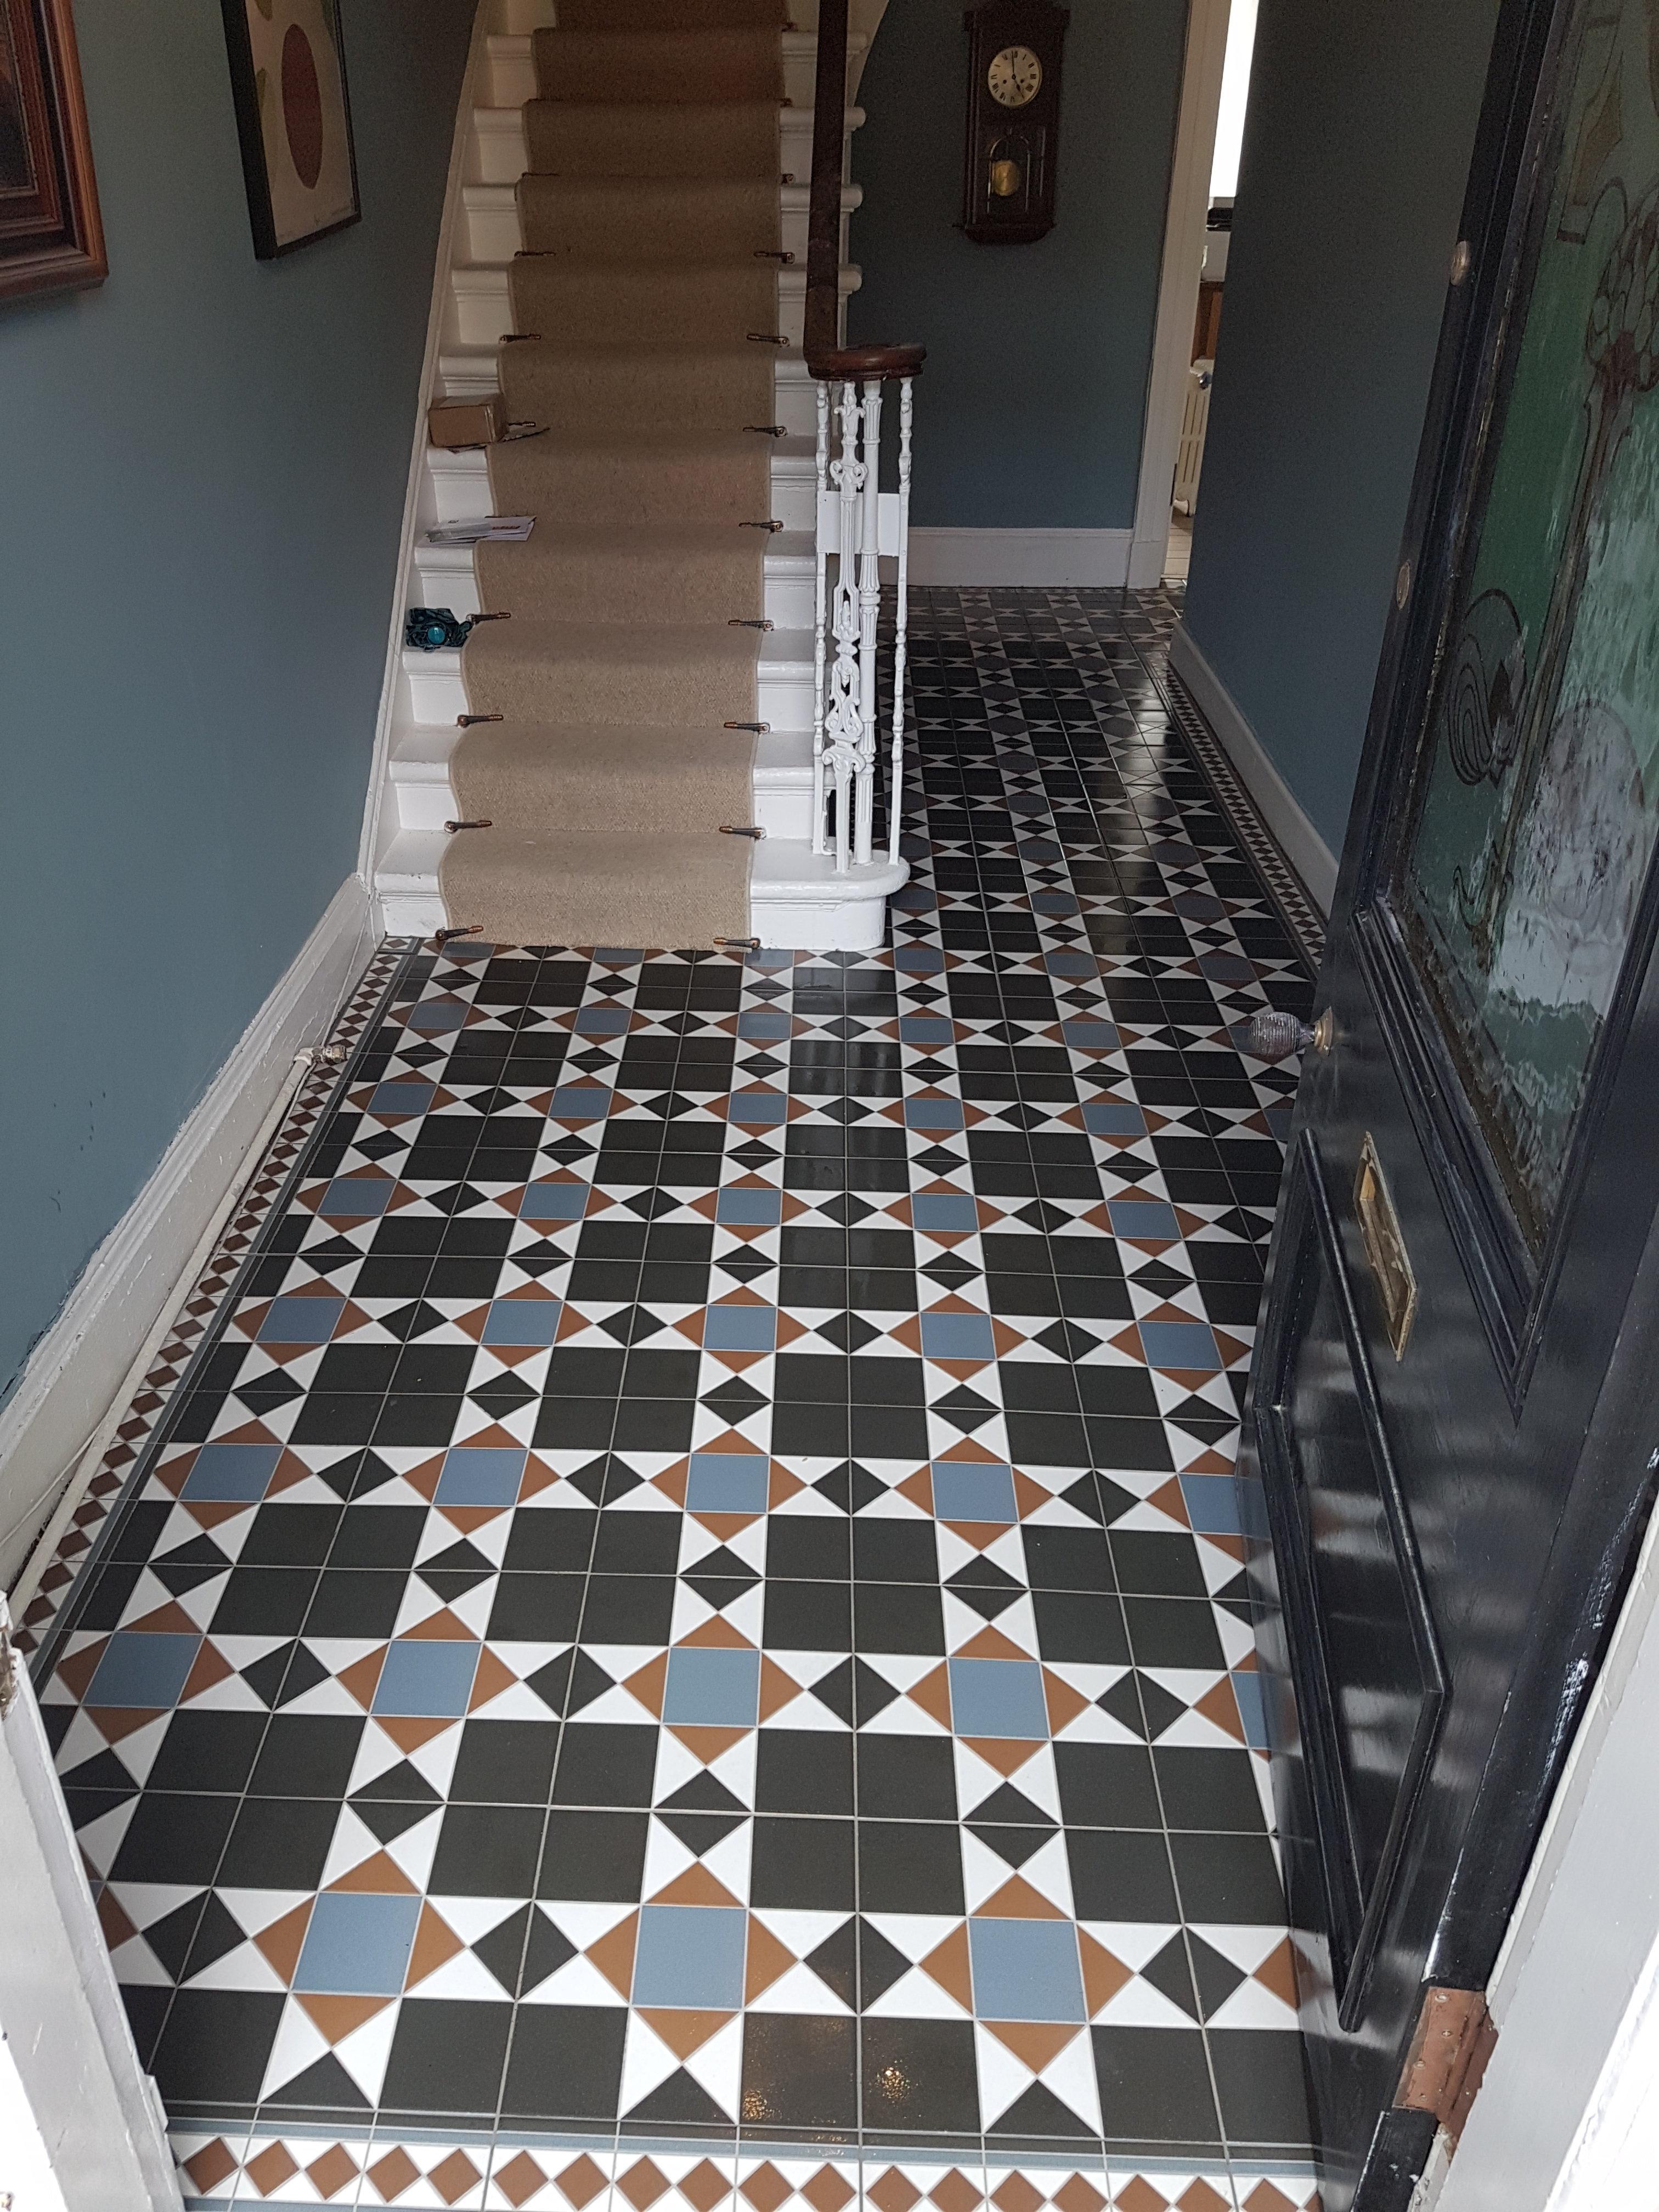 Kitchen Tiling Glasgow Renfrewshire Lanarkshire - ACE Quality Tiling